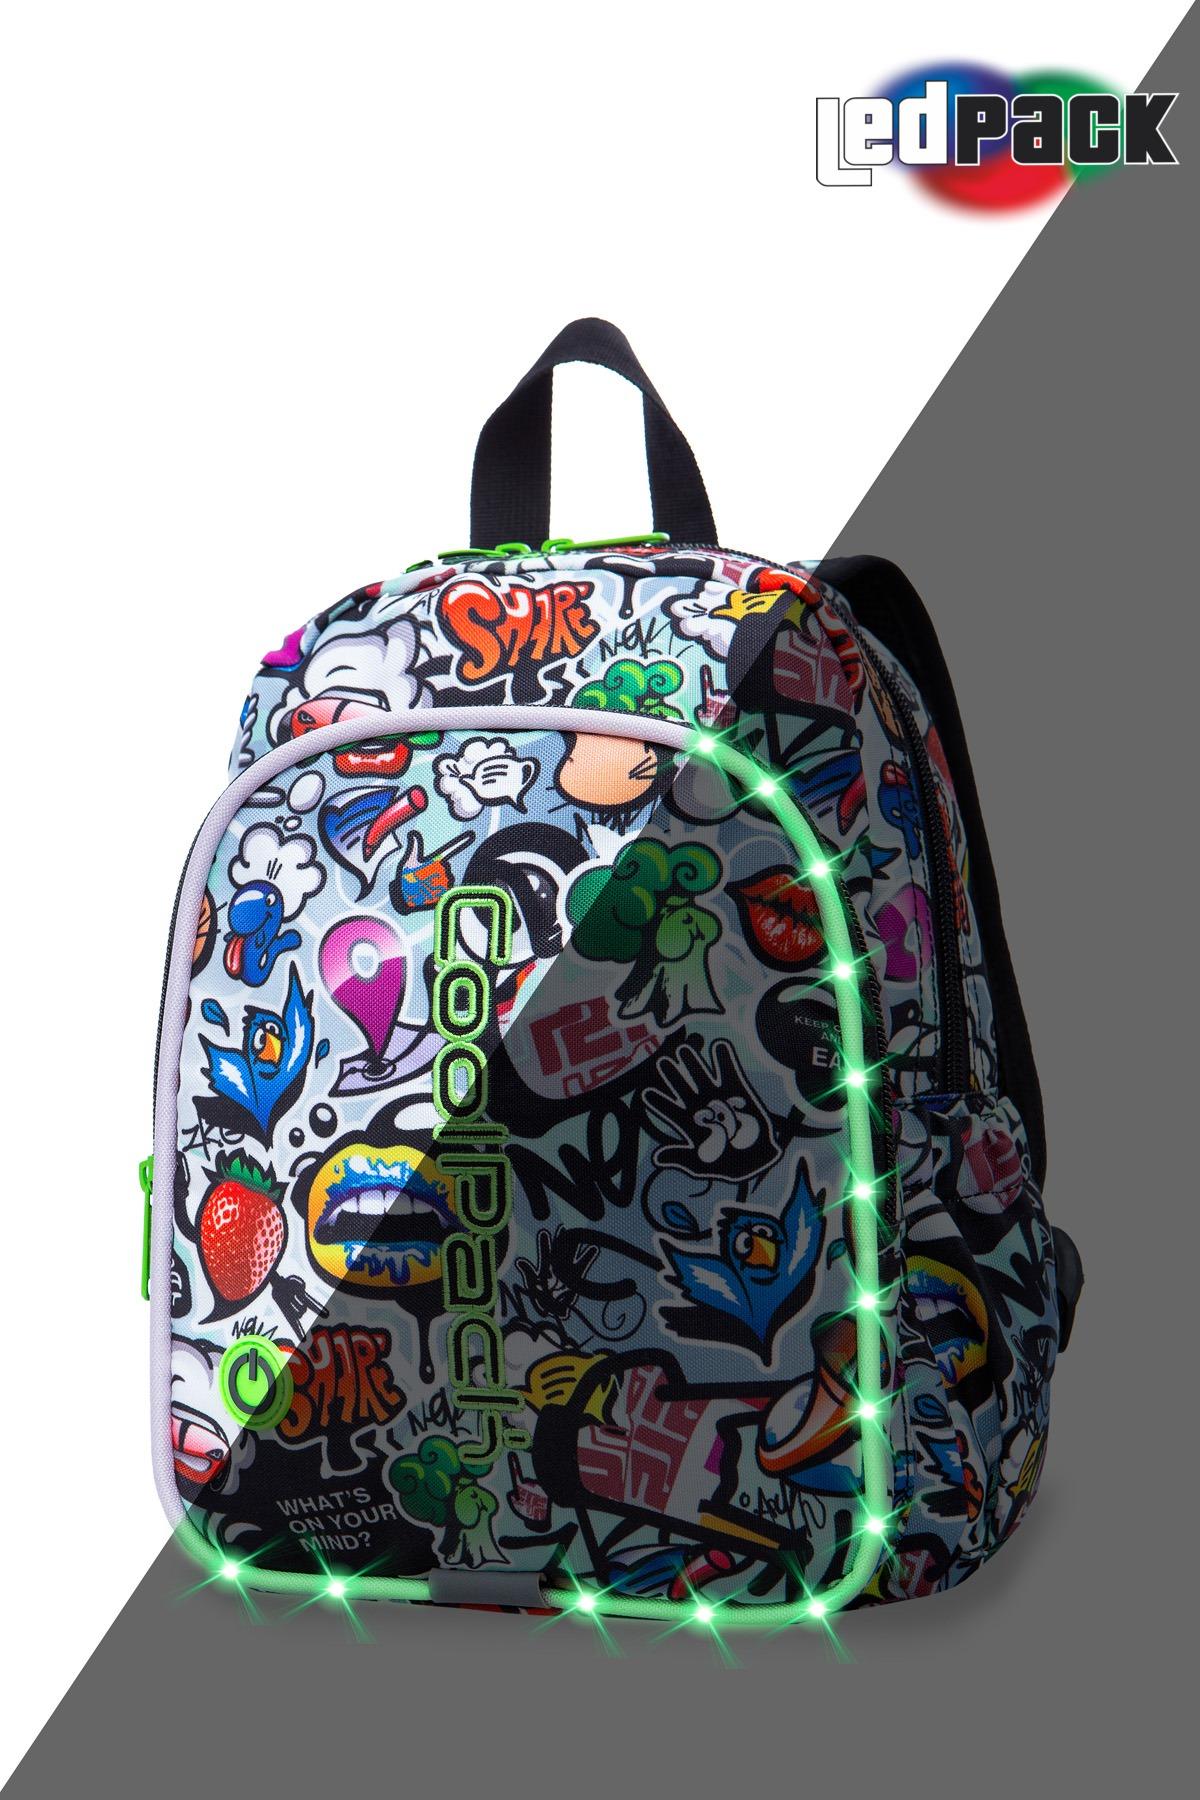 Coolpack - bobby - kids backpack - led graffiti